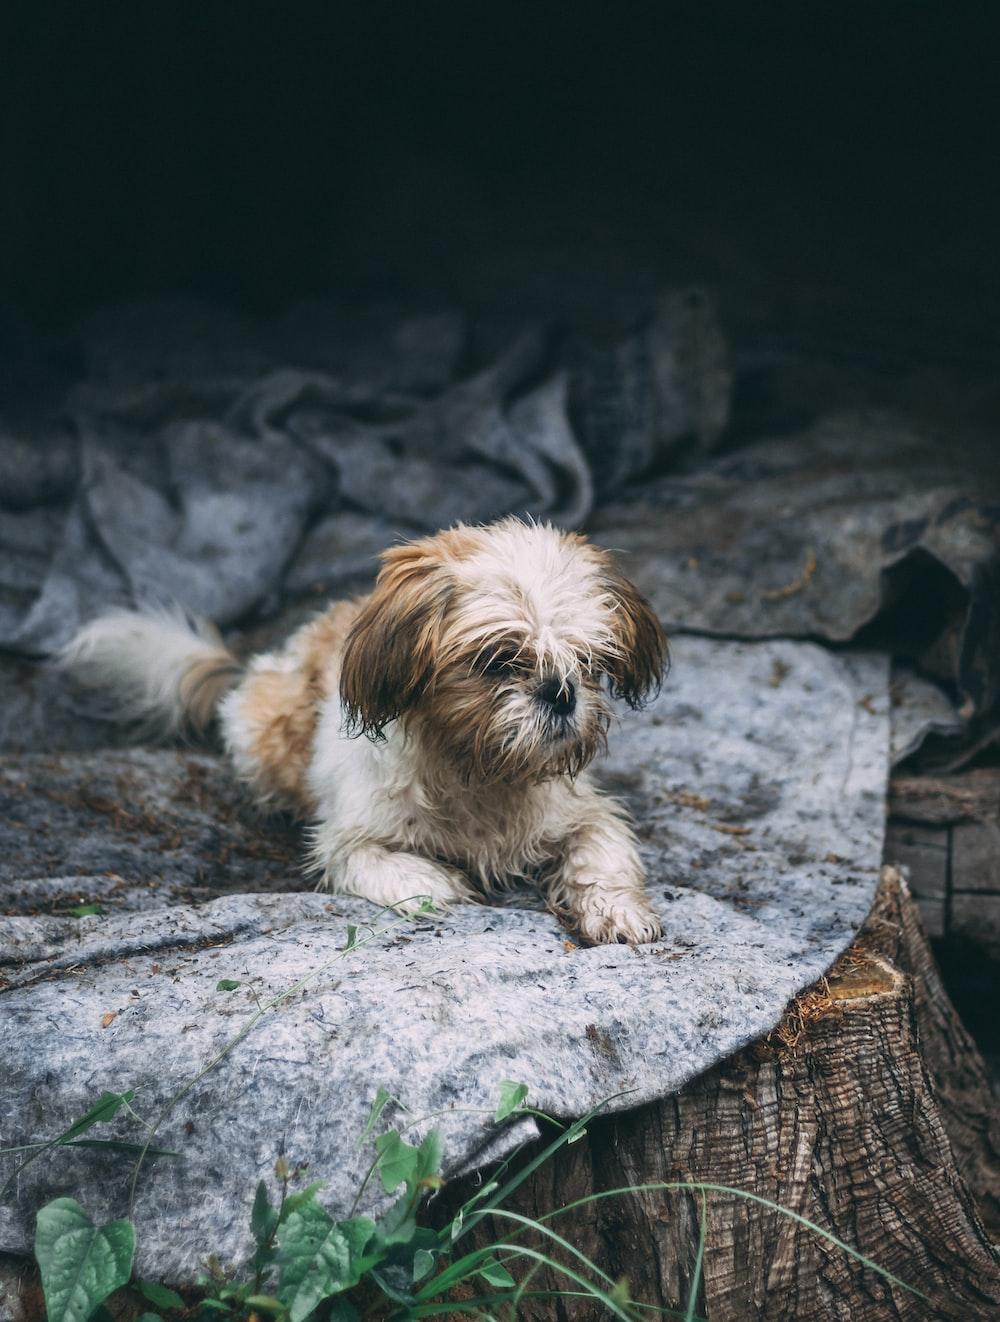 Shih Tzu resting on rock